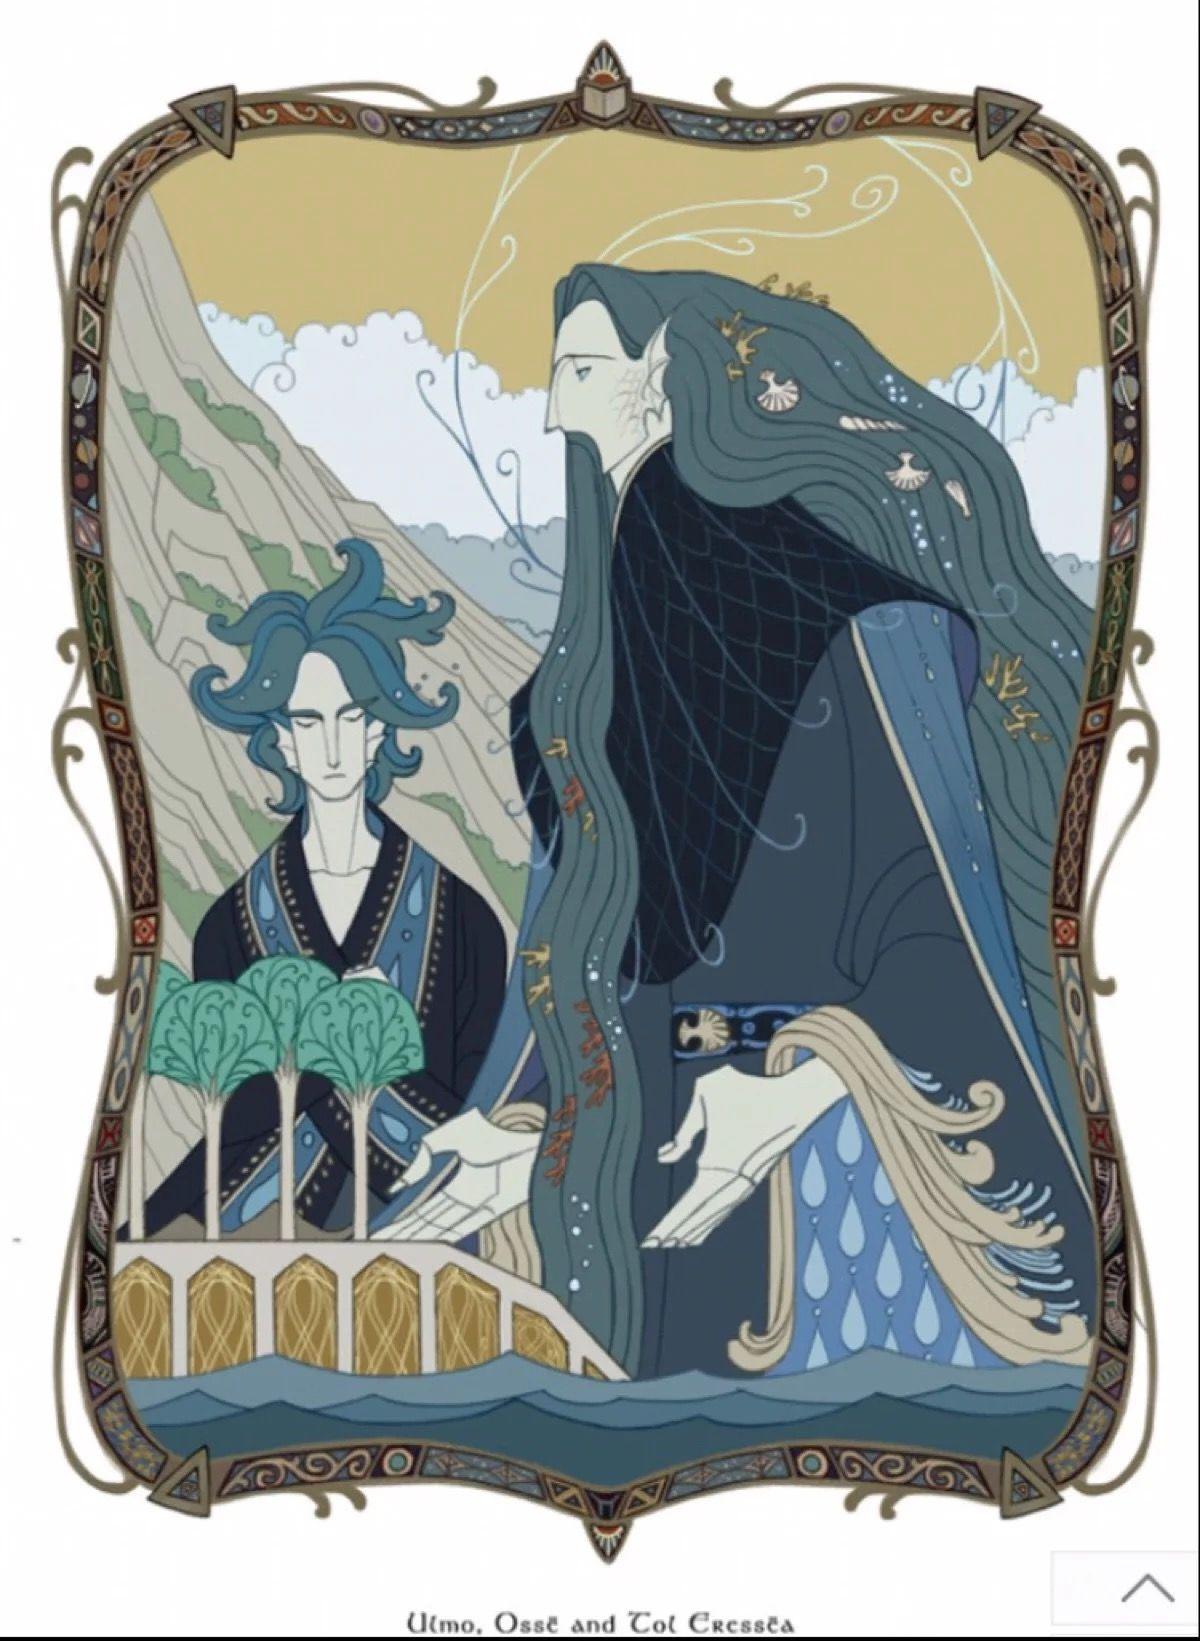 Ulmo and Ossë